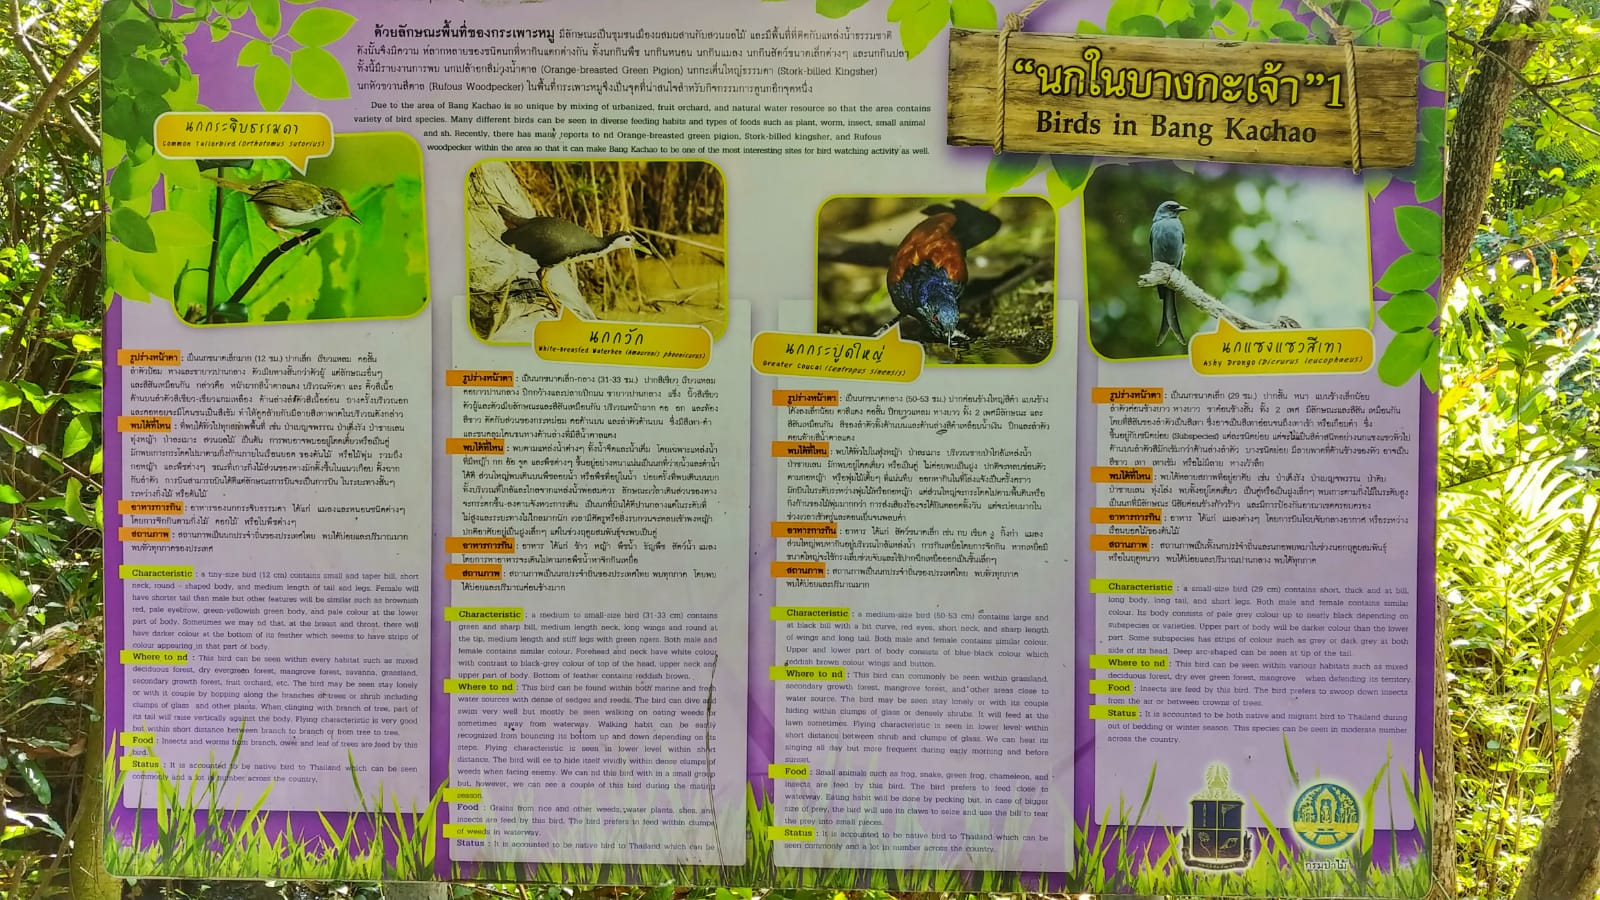 Bang Krachao tablica informacyjna